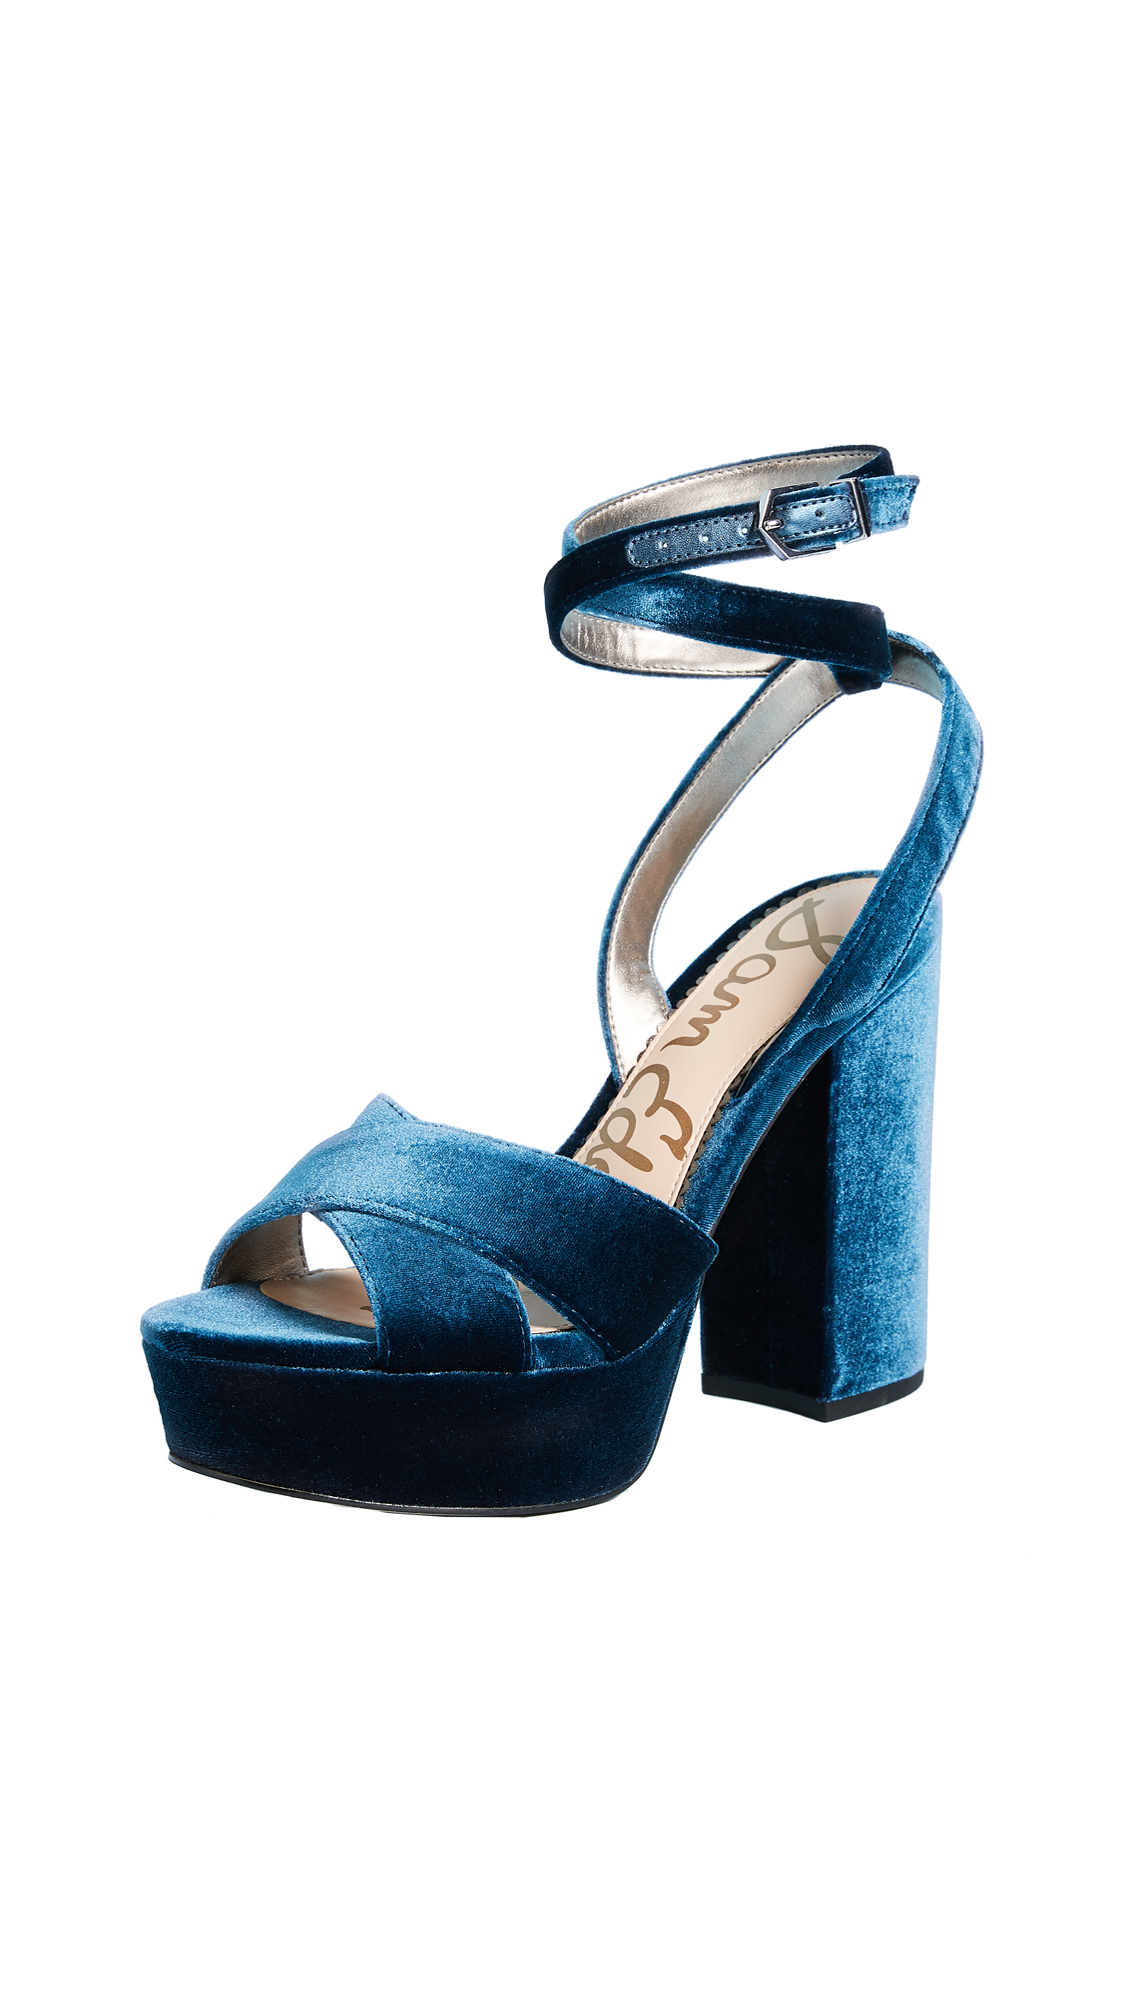 Sam Edelman Mara Platform Sandals - Jewel Blue